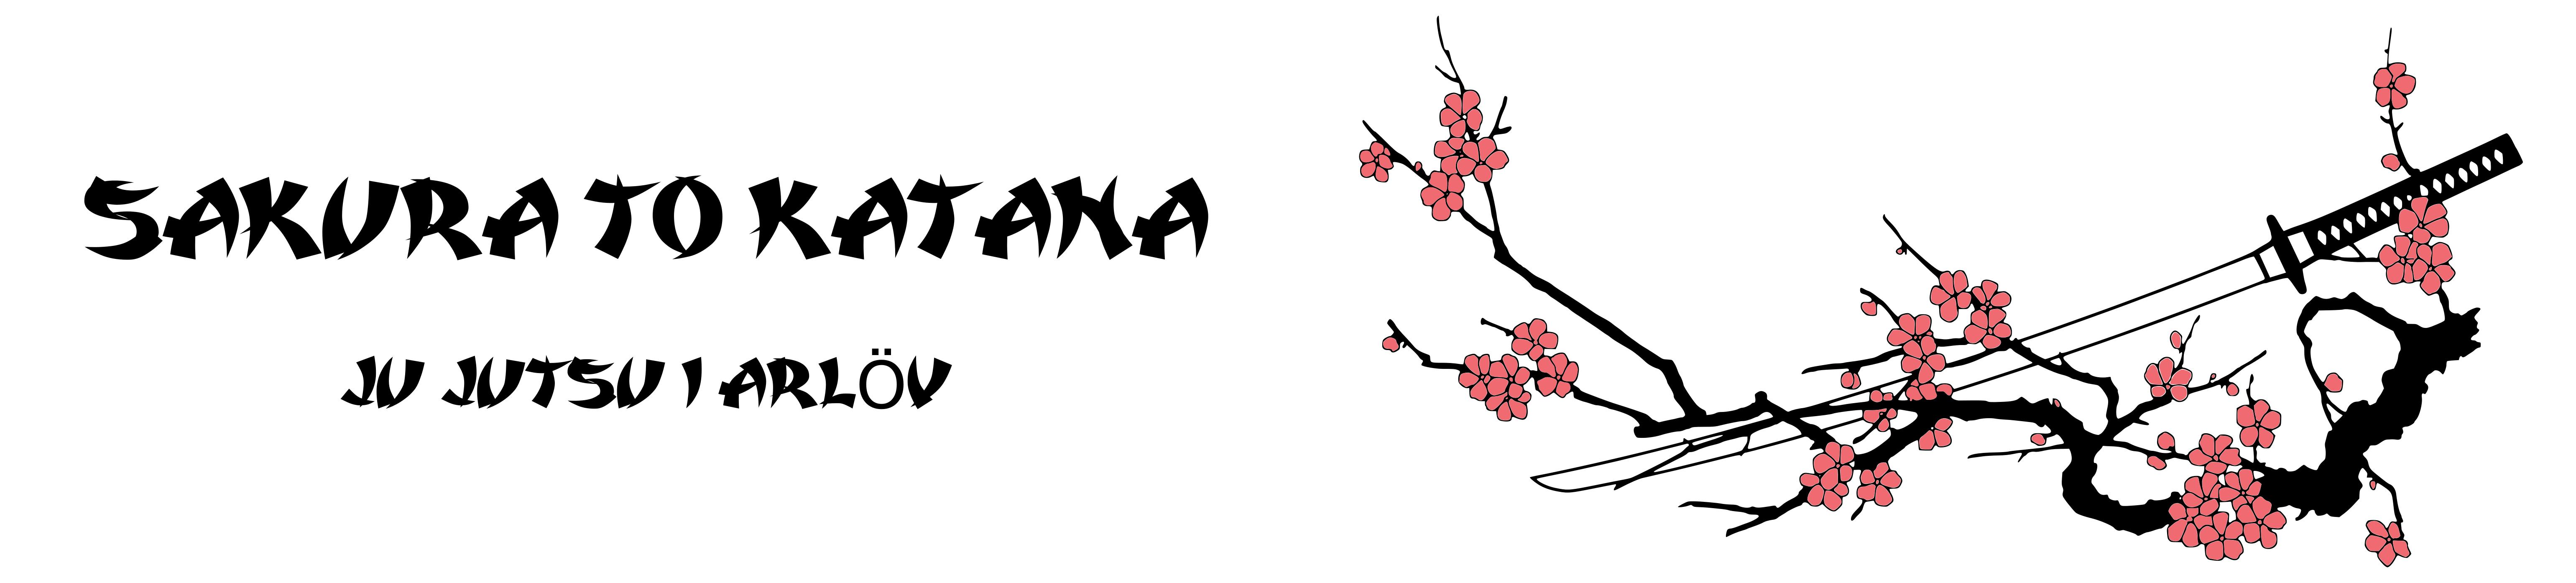 Sakura To Katana